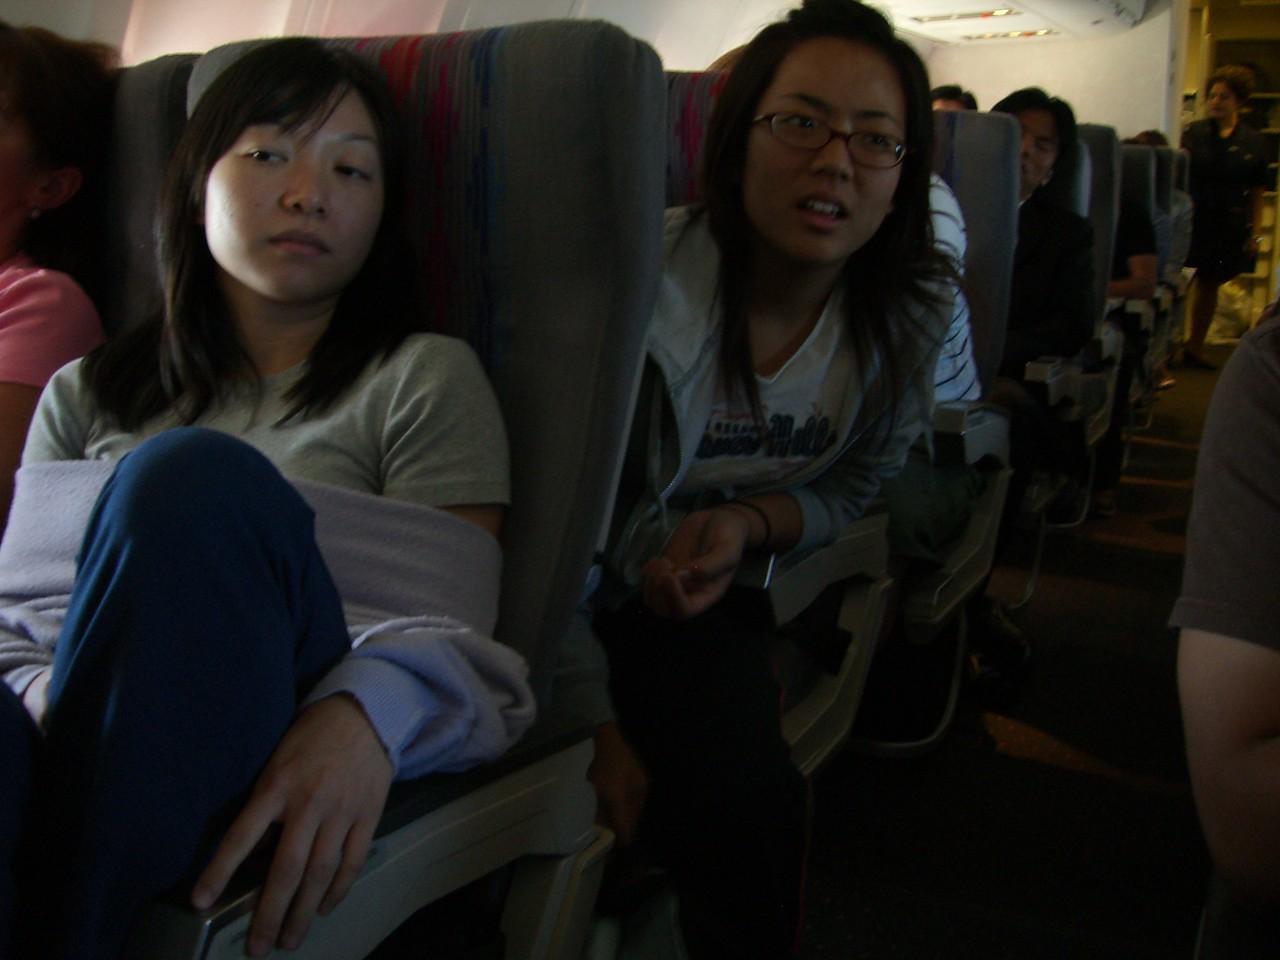 2006 07 12 Wed - Alice Tung & Shinae Kim on the plane